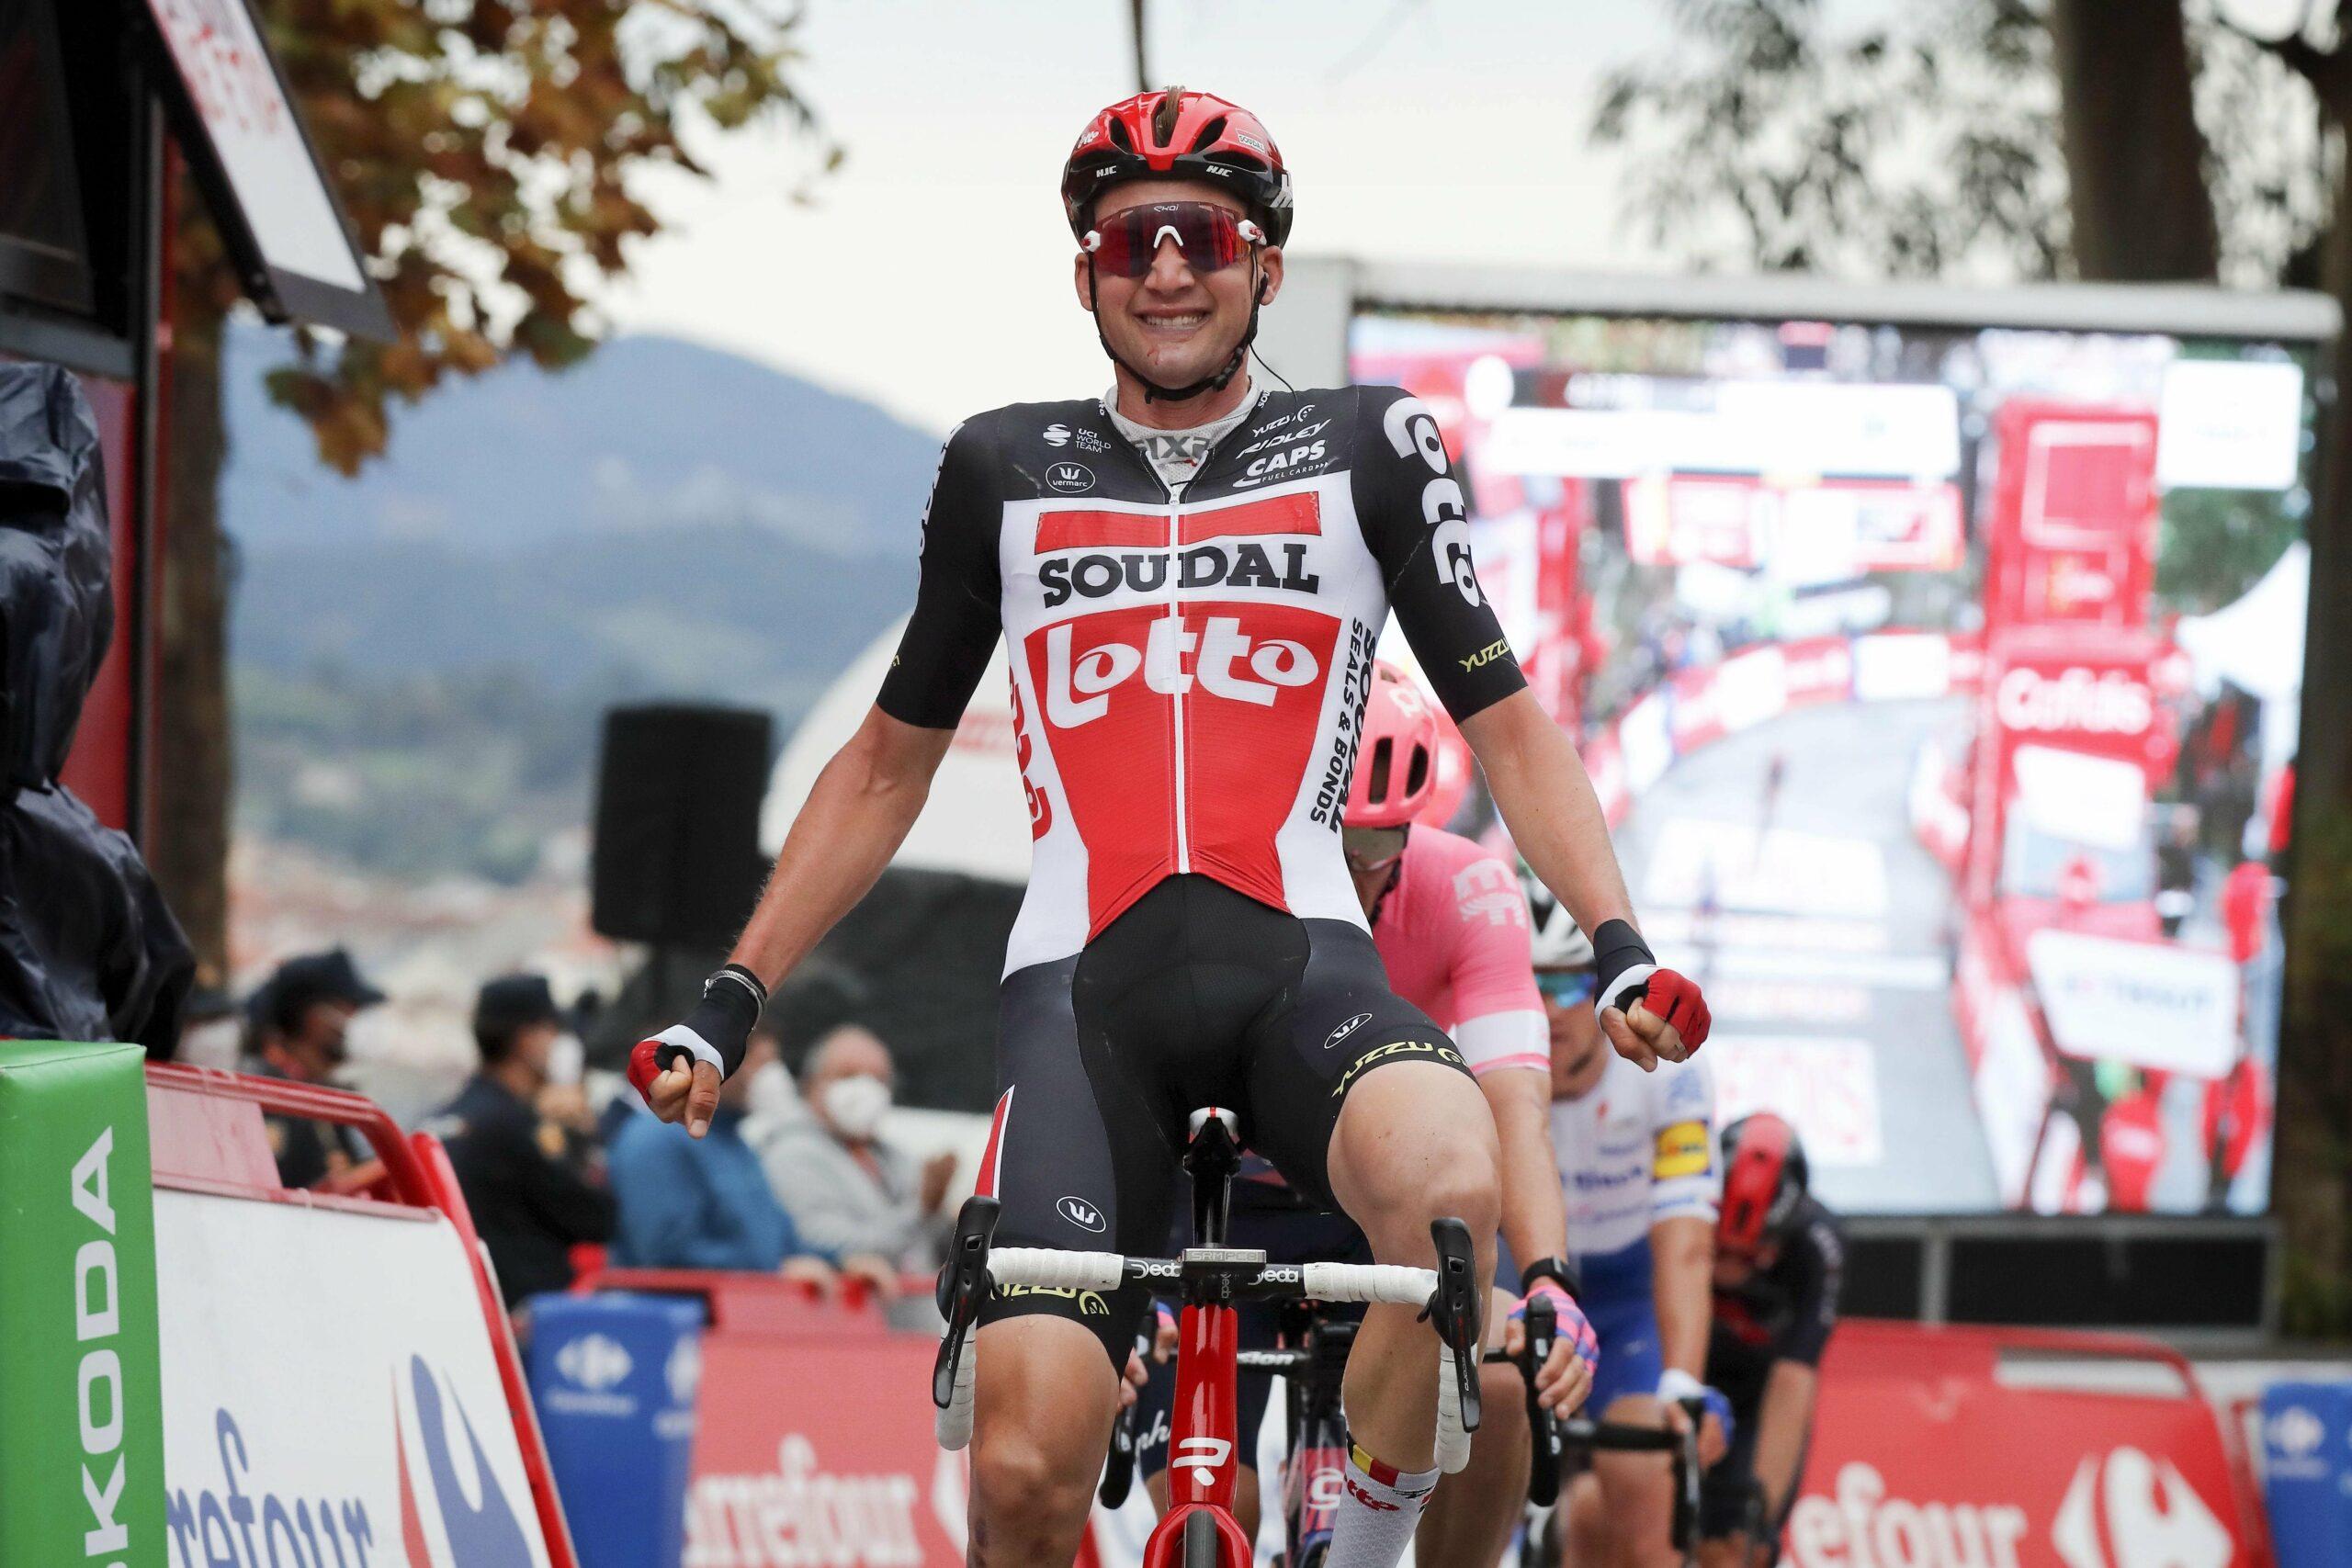 Tim Wellens-sejr på 14. etape i Vuelta a Espana. Roglič fortsat i front